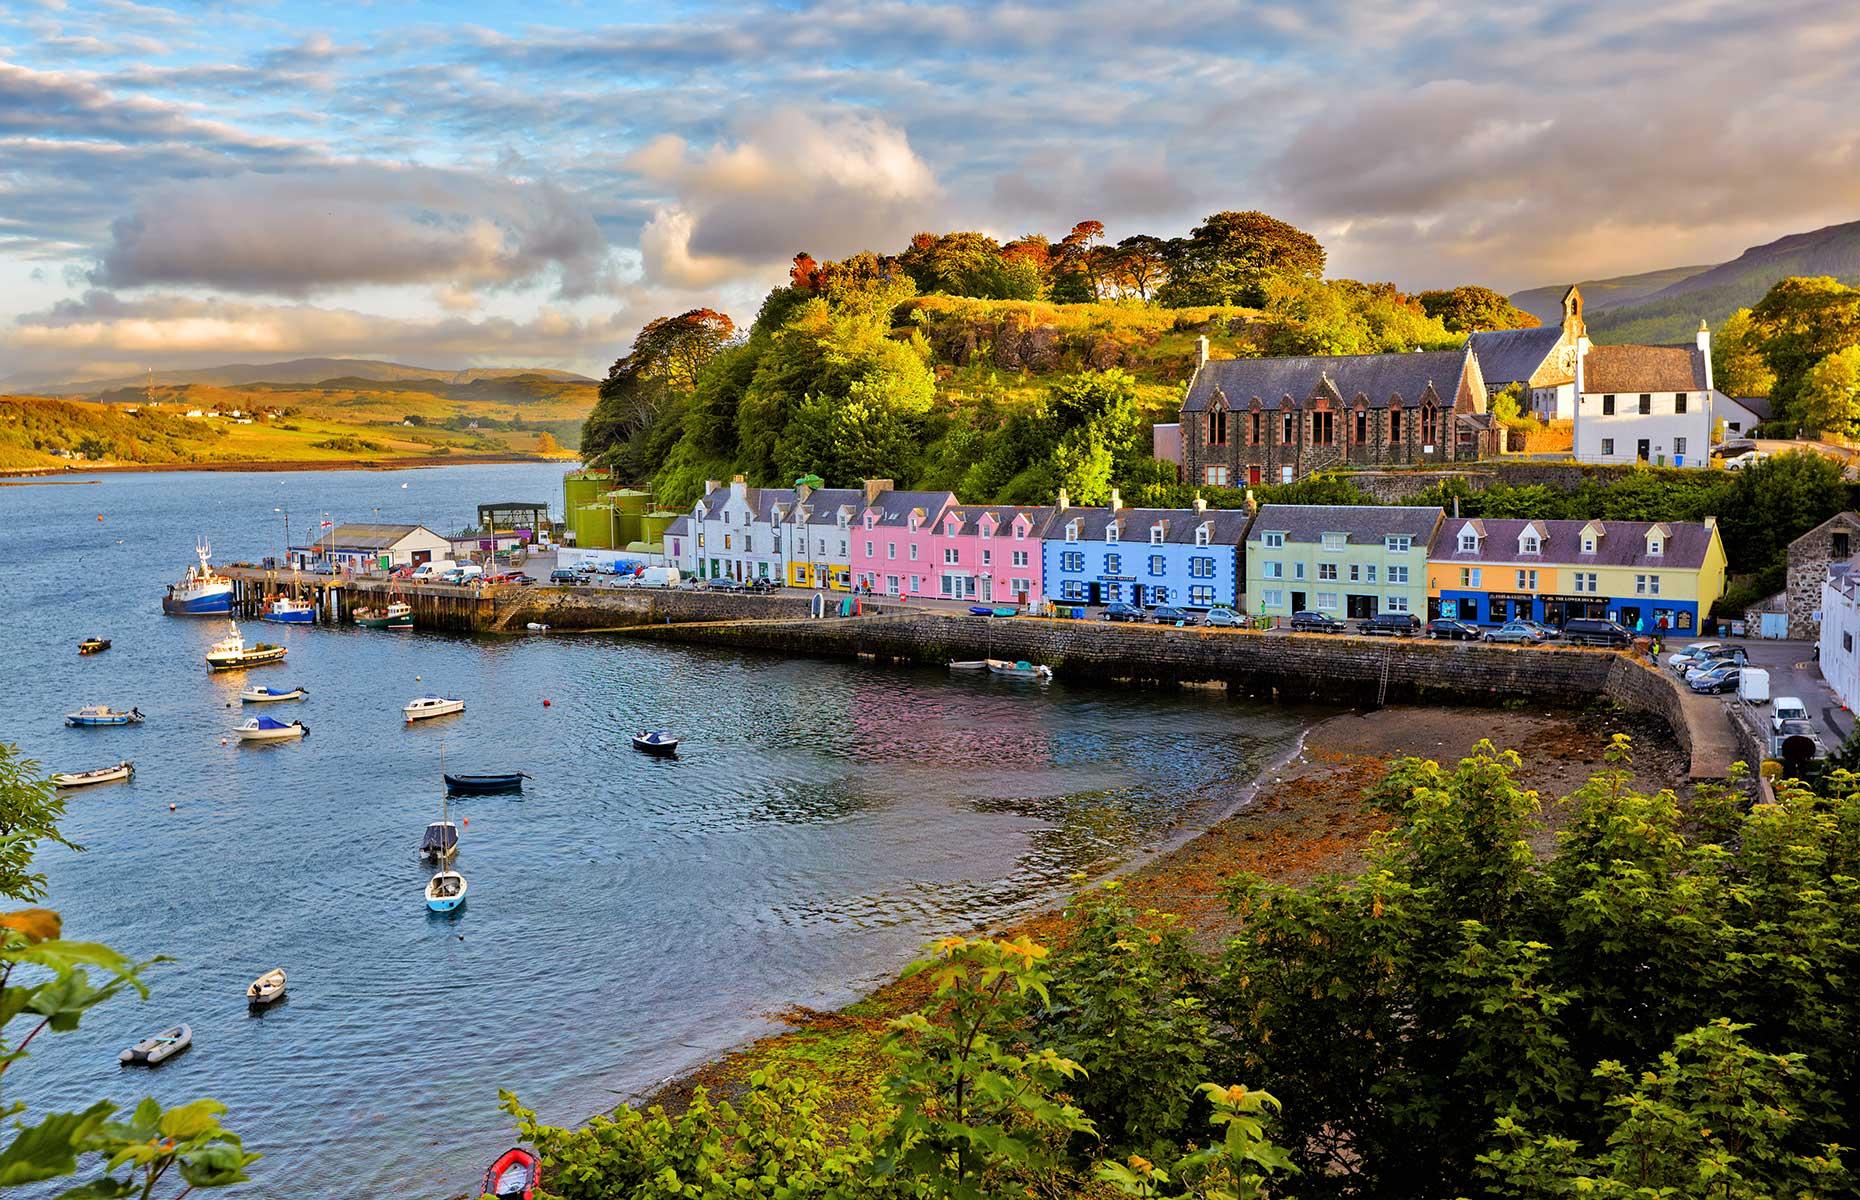 Portree, Isle of Skye, Scotland (Images: Nataliya Hora/Shutterstock)